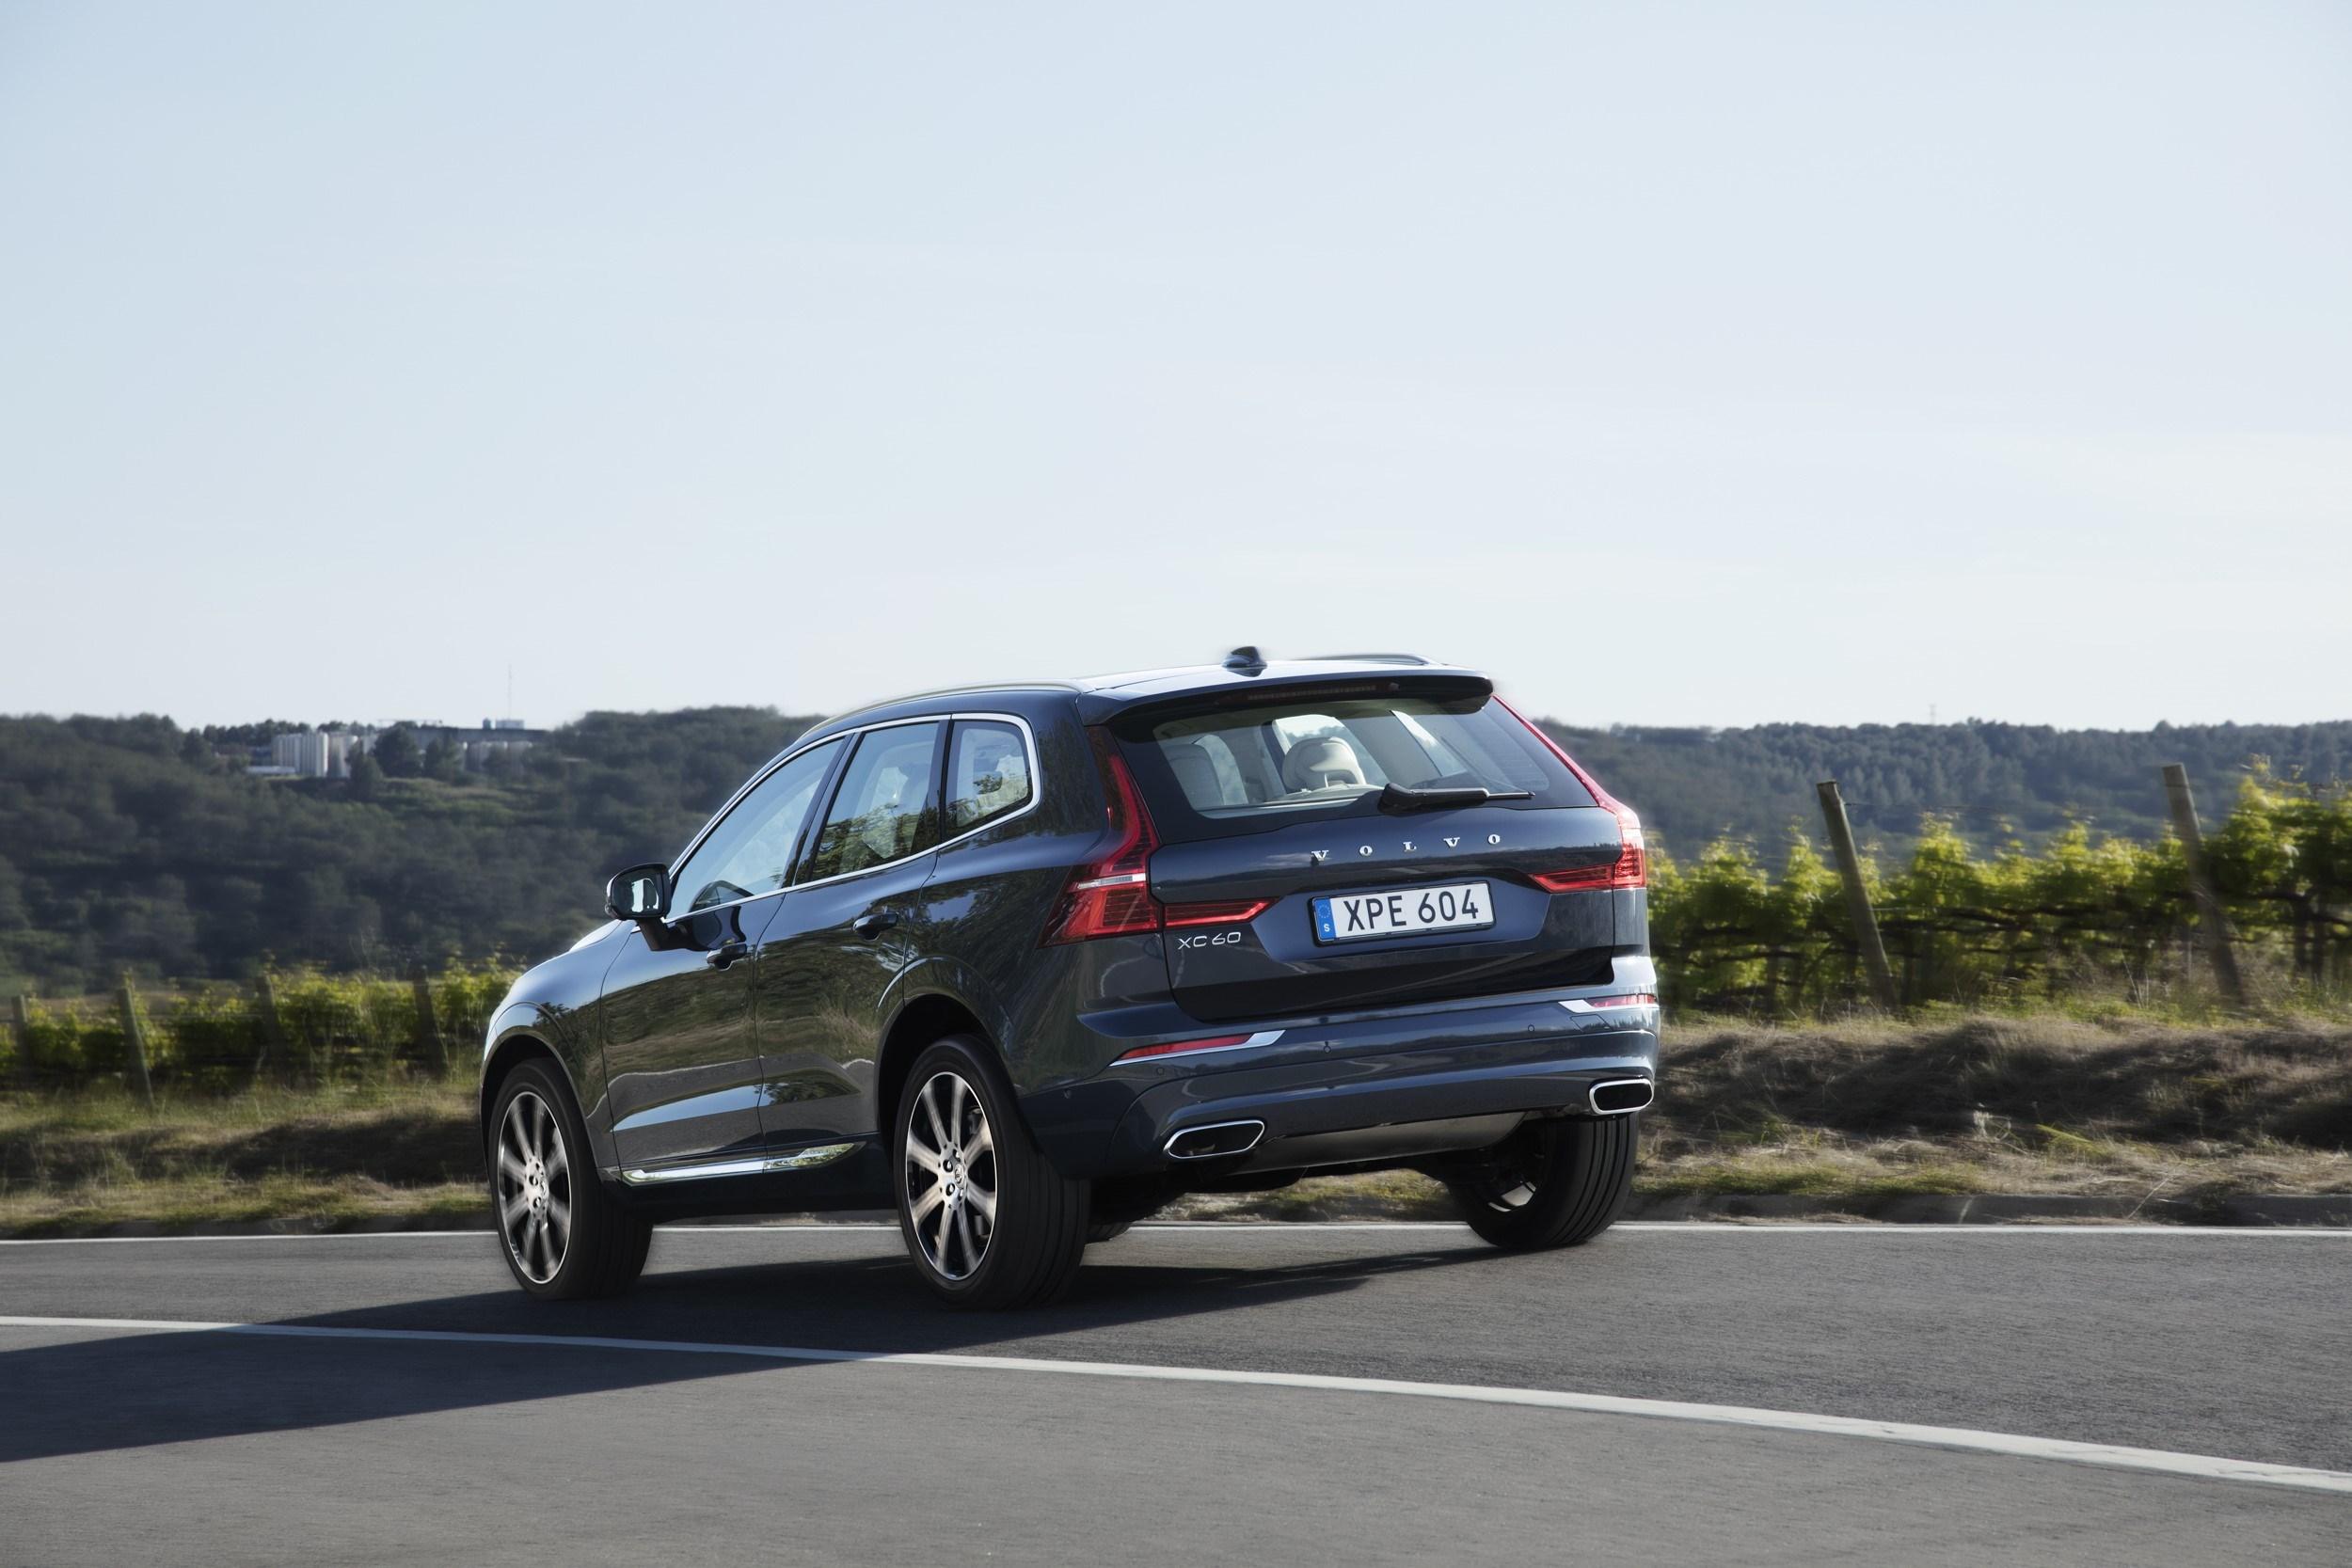 The new Volvo XC60 T6 – Minuto Motor